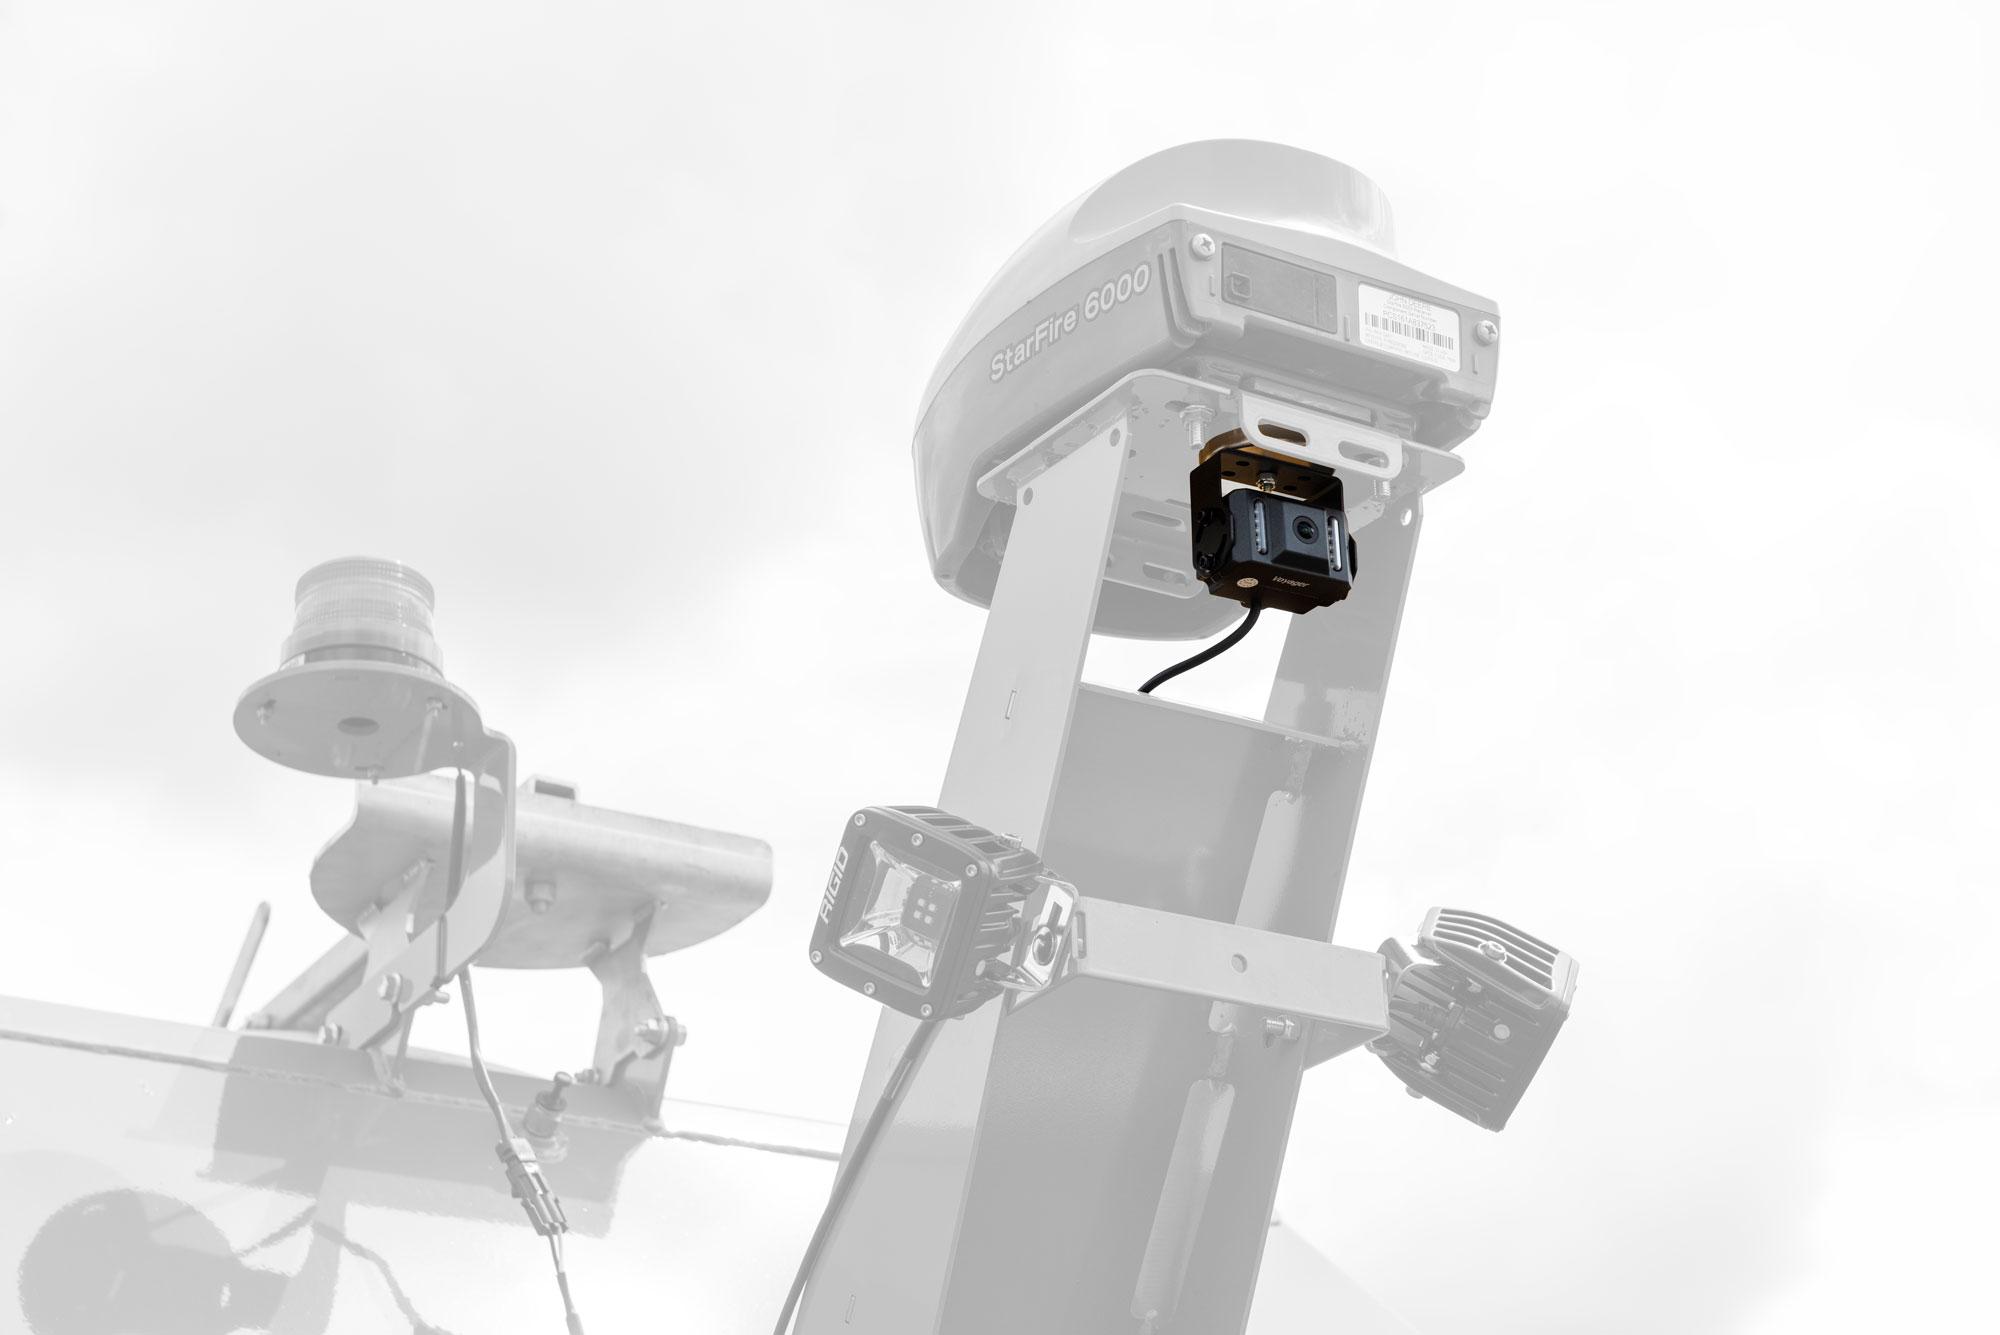 camera-kit-01